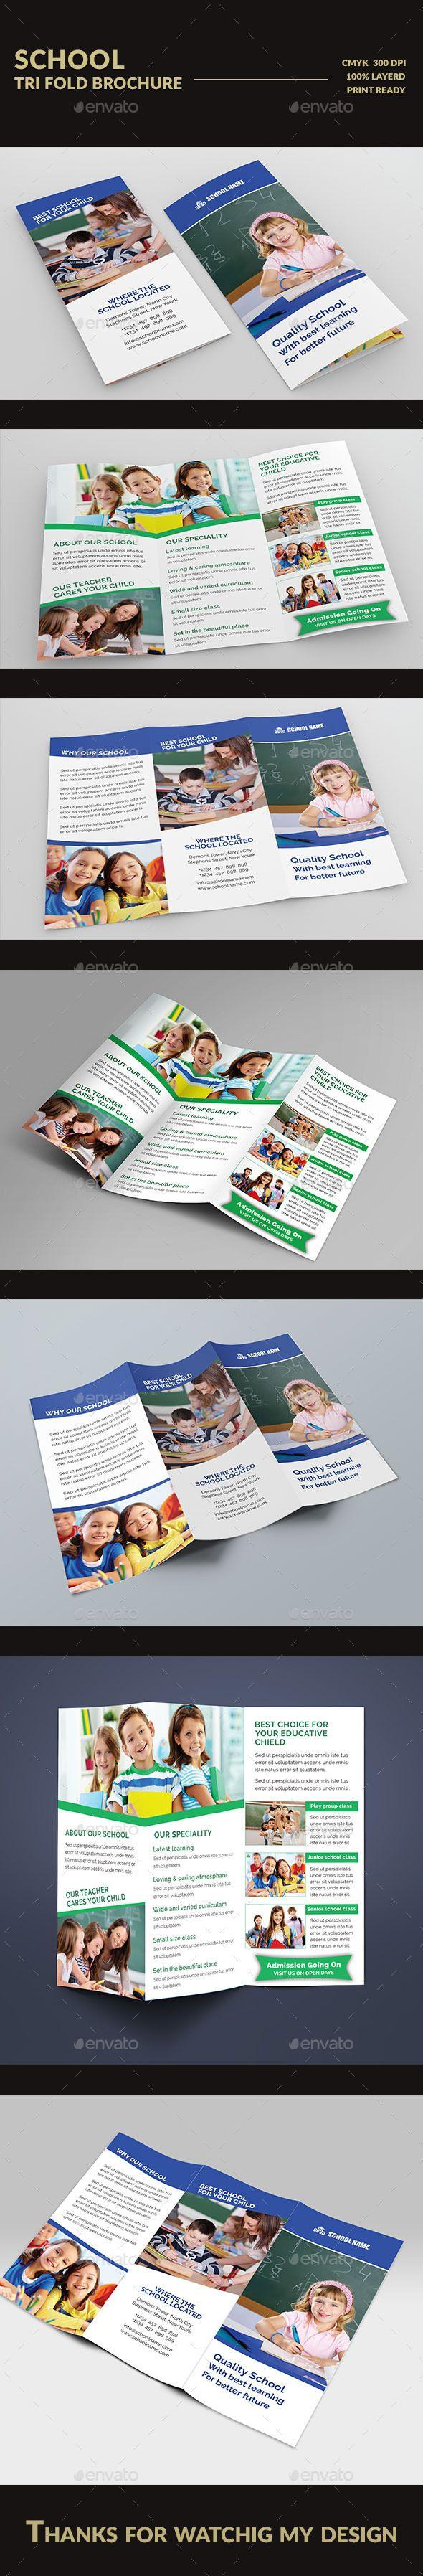 School Tri fold Brochure - Brochures Print Templates